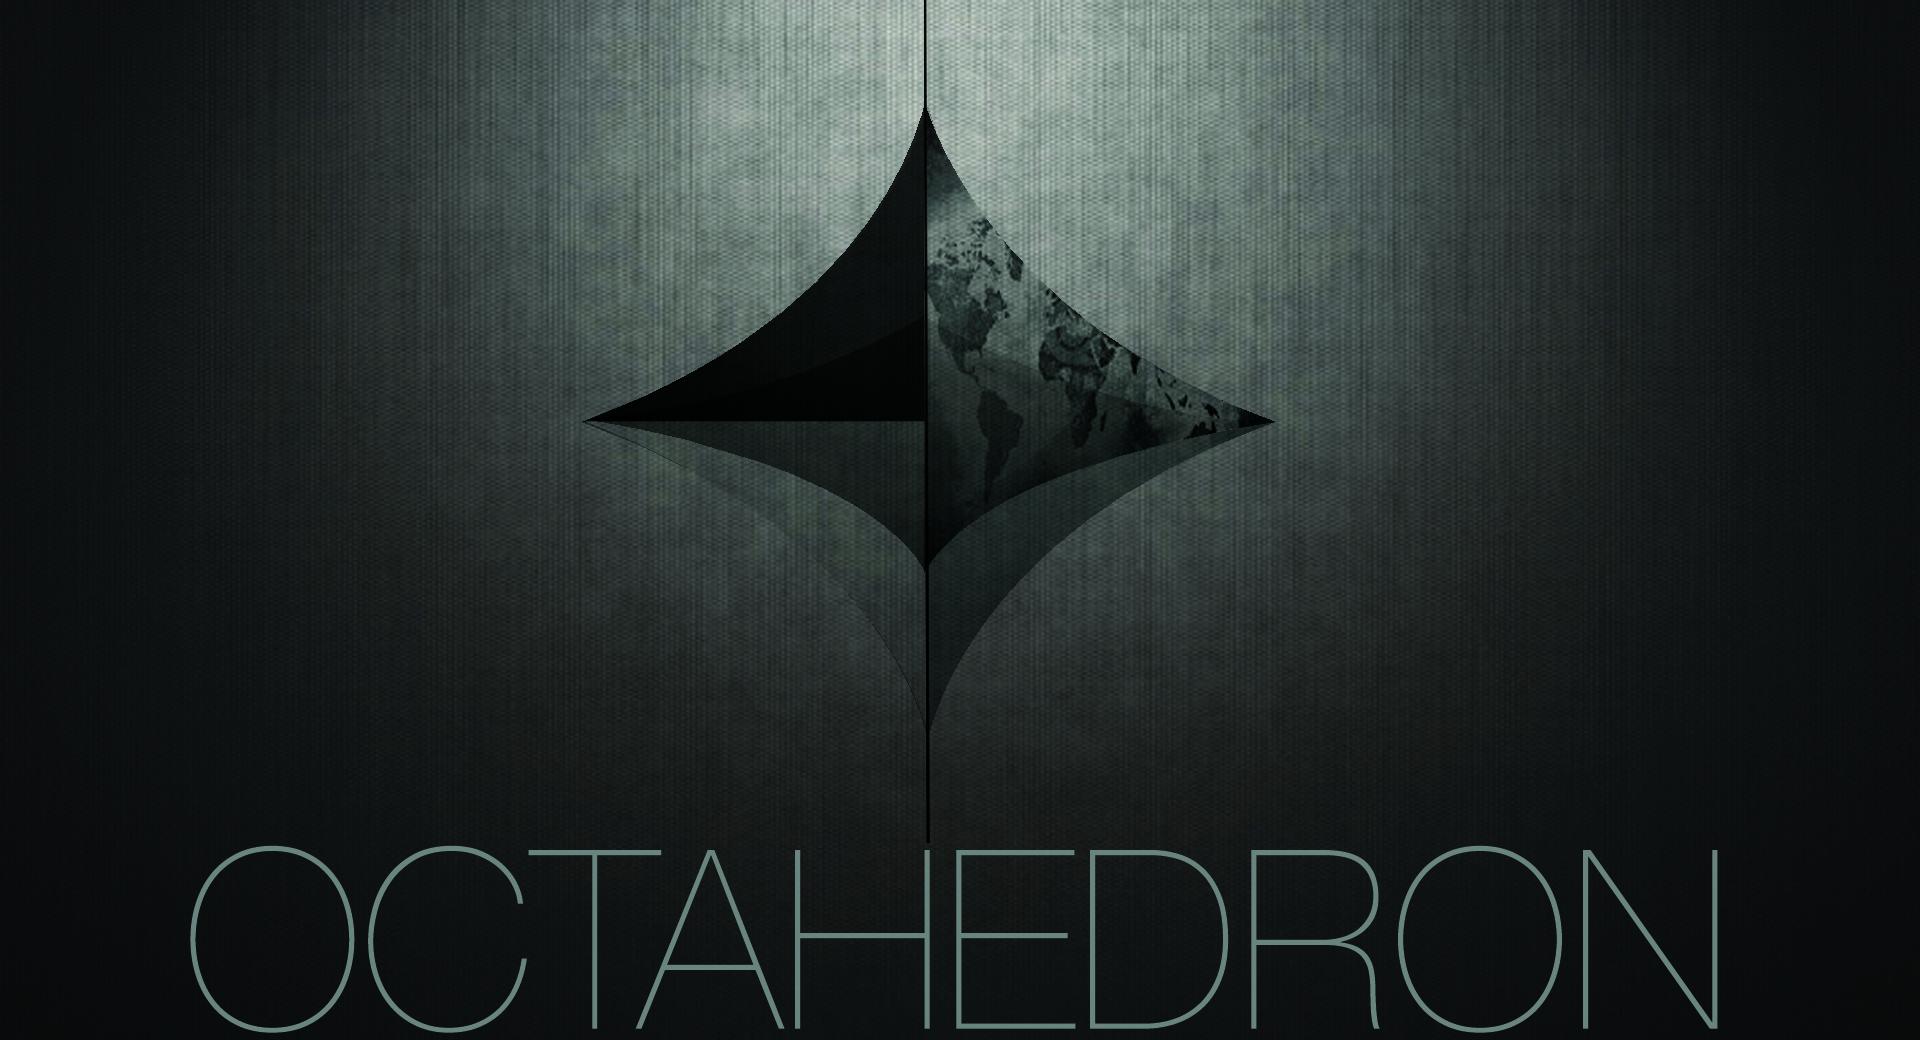 Octahedron Top.jpg